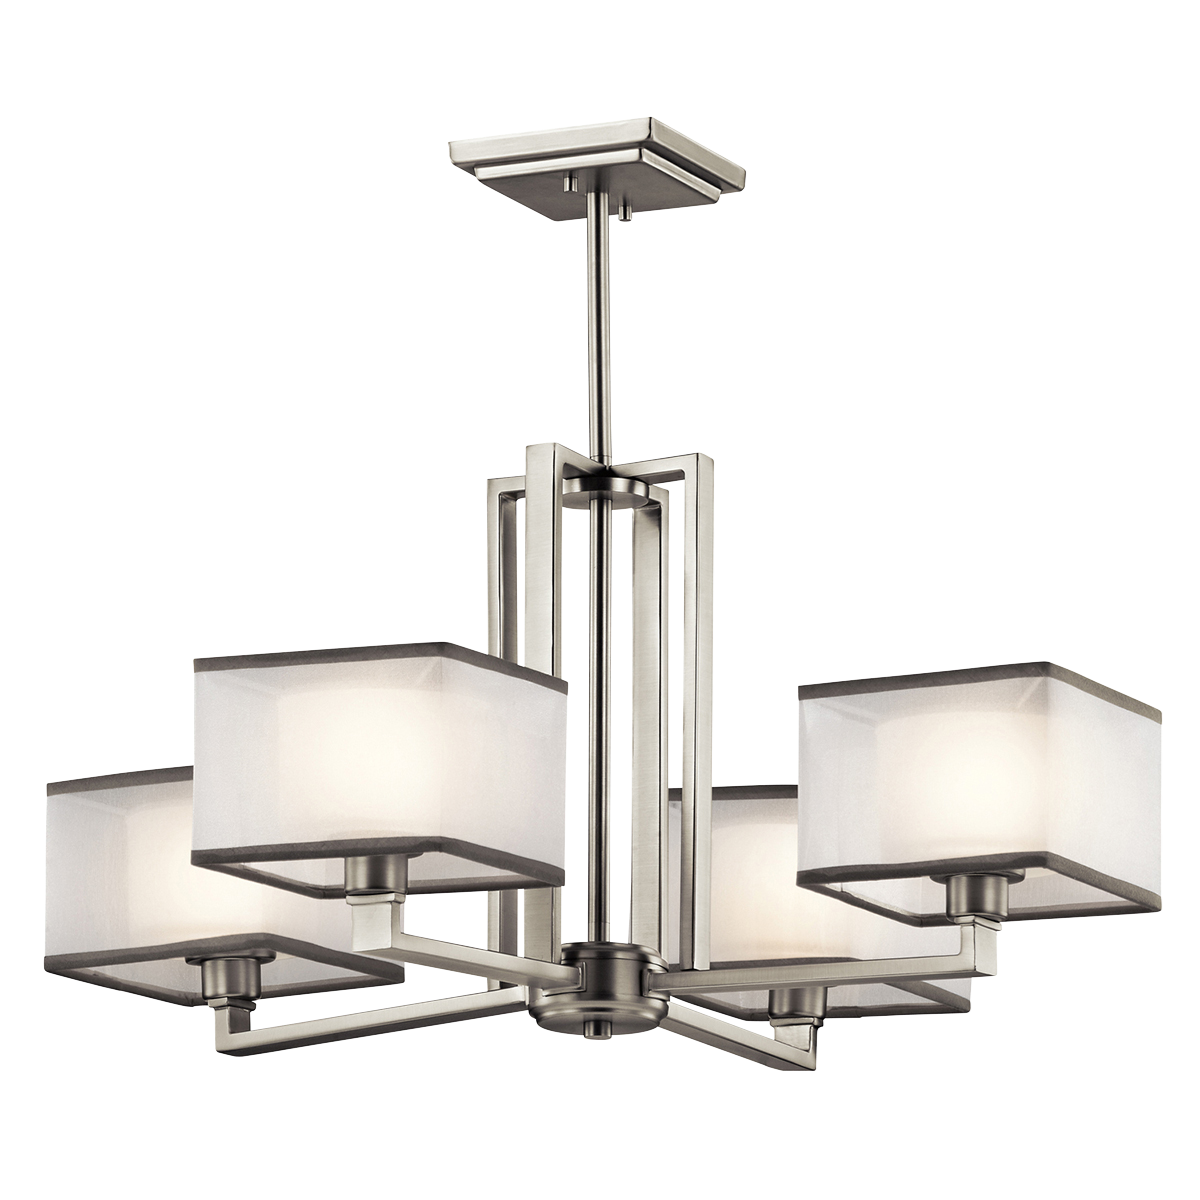 4 Light Chandelier - Kailey Collection $278 | lighting | Pinterest ... for Modern Chandelier Png  181plt